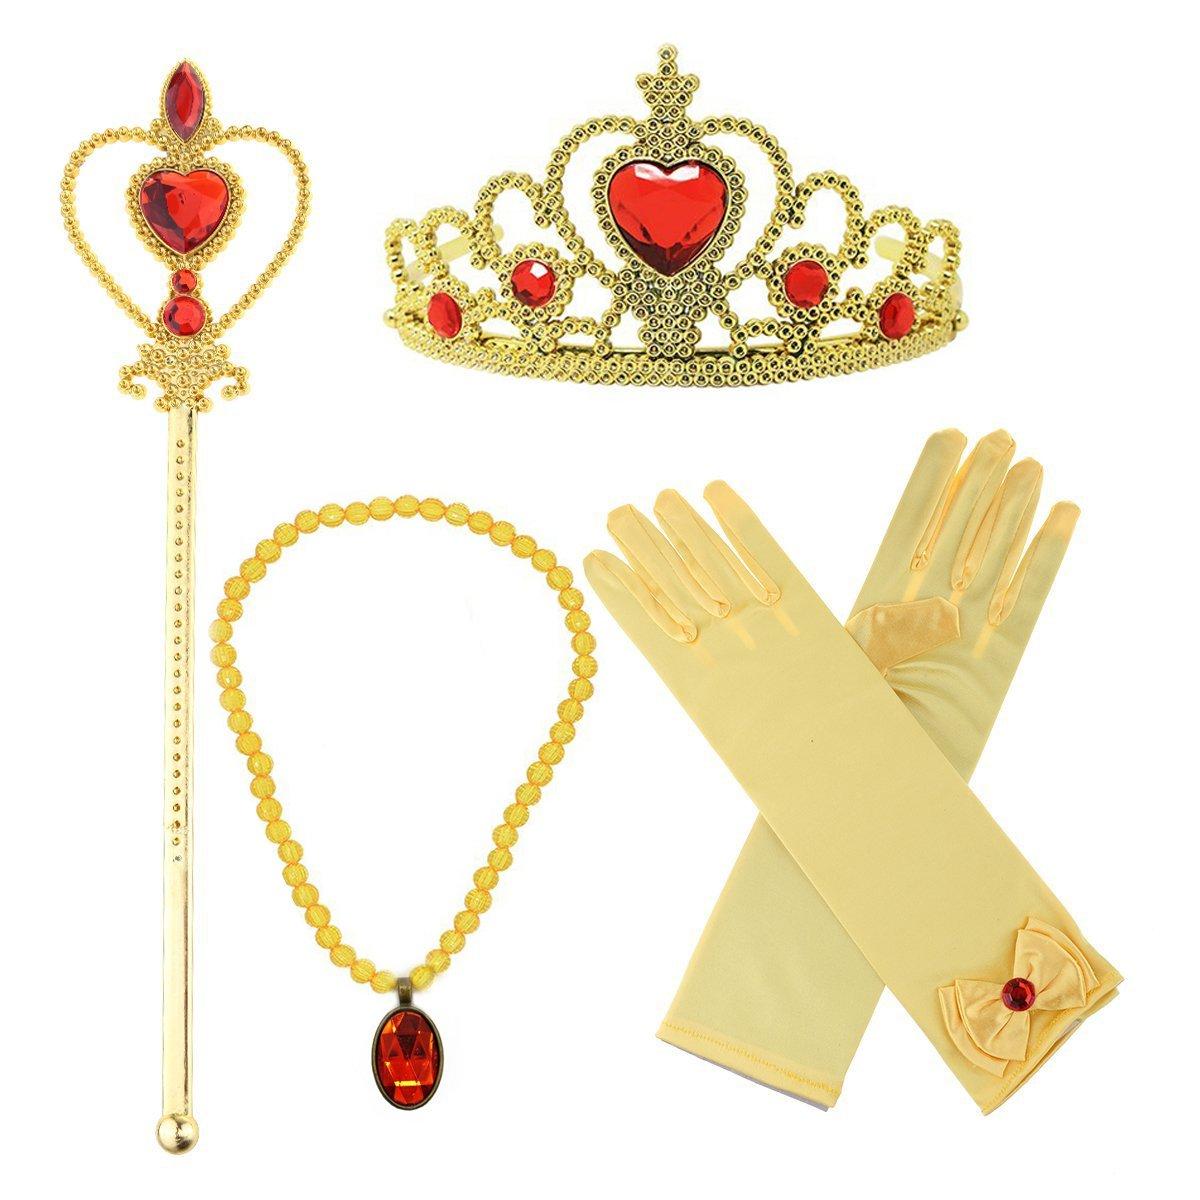 Hpwai Girls Princess Belle Dress Up Costume Accessories,Crown Necklace Wand Gloves Gift Set